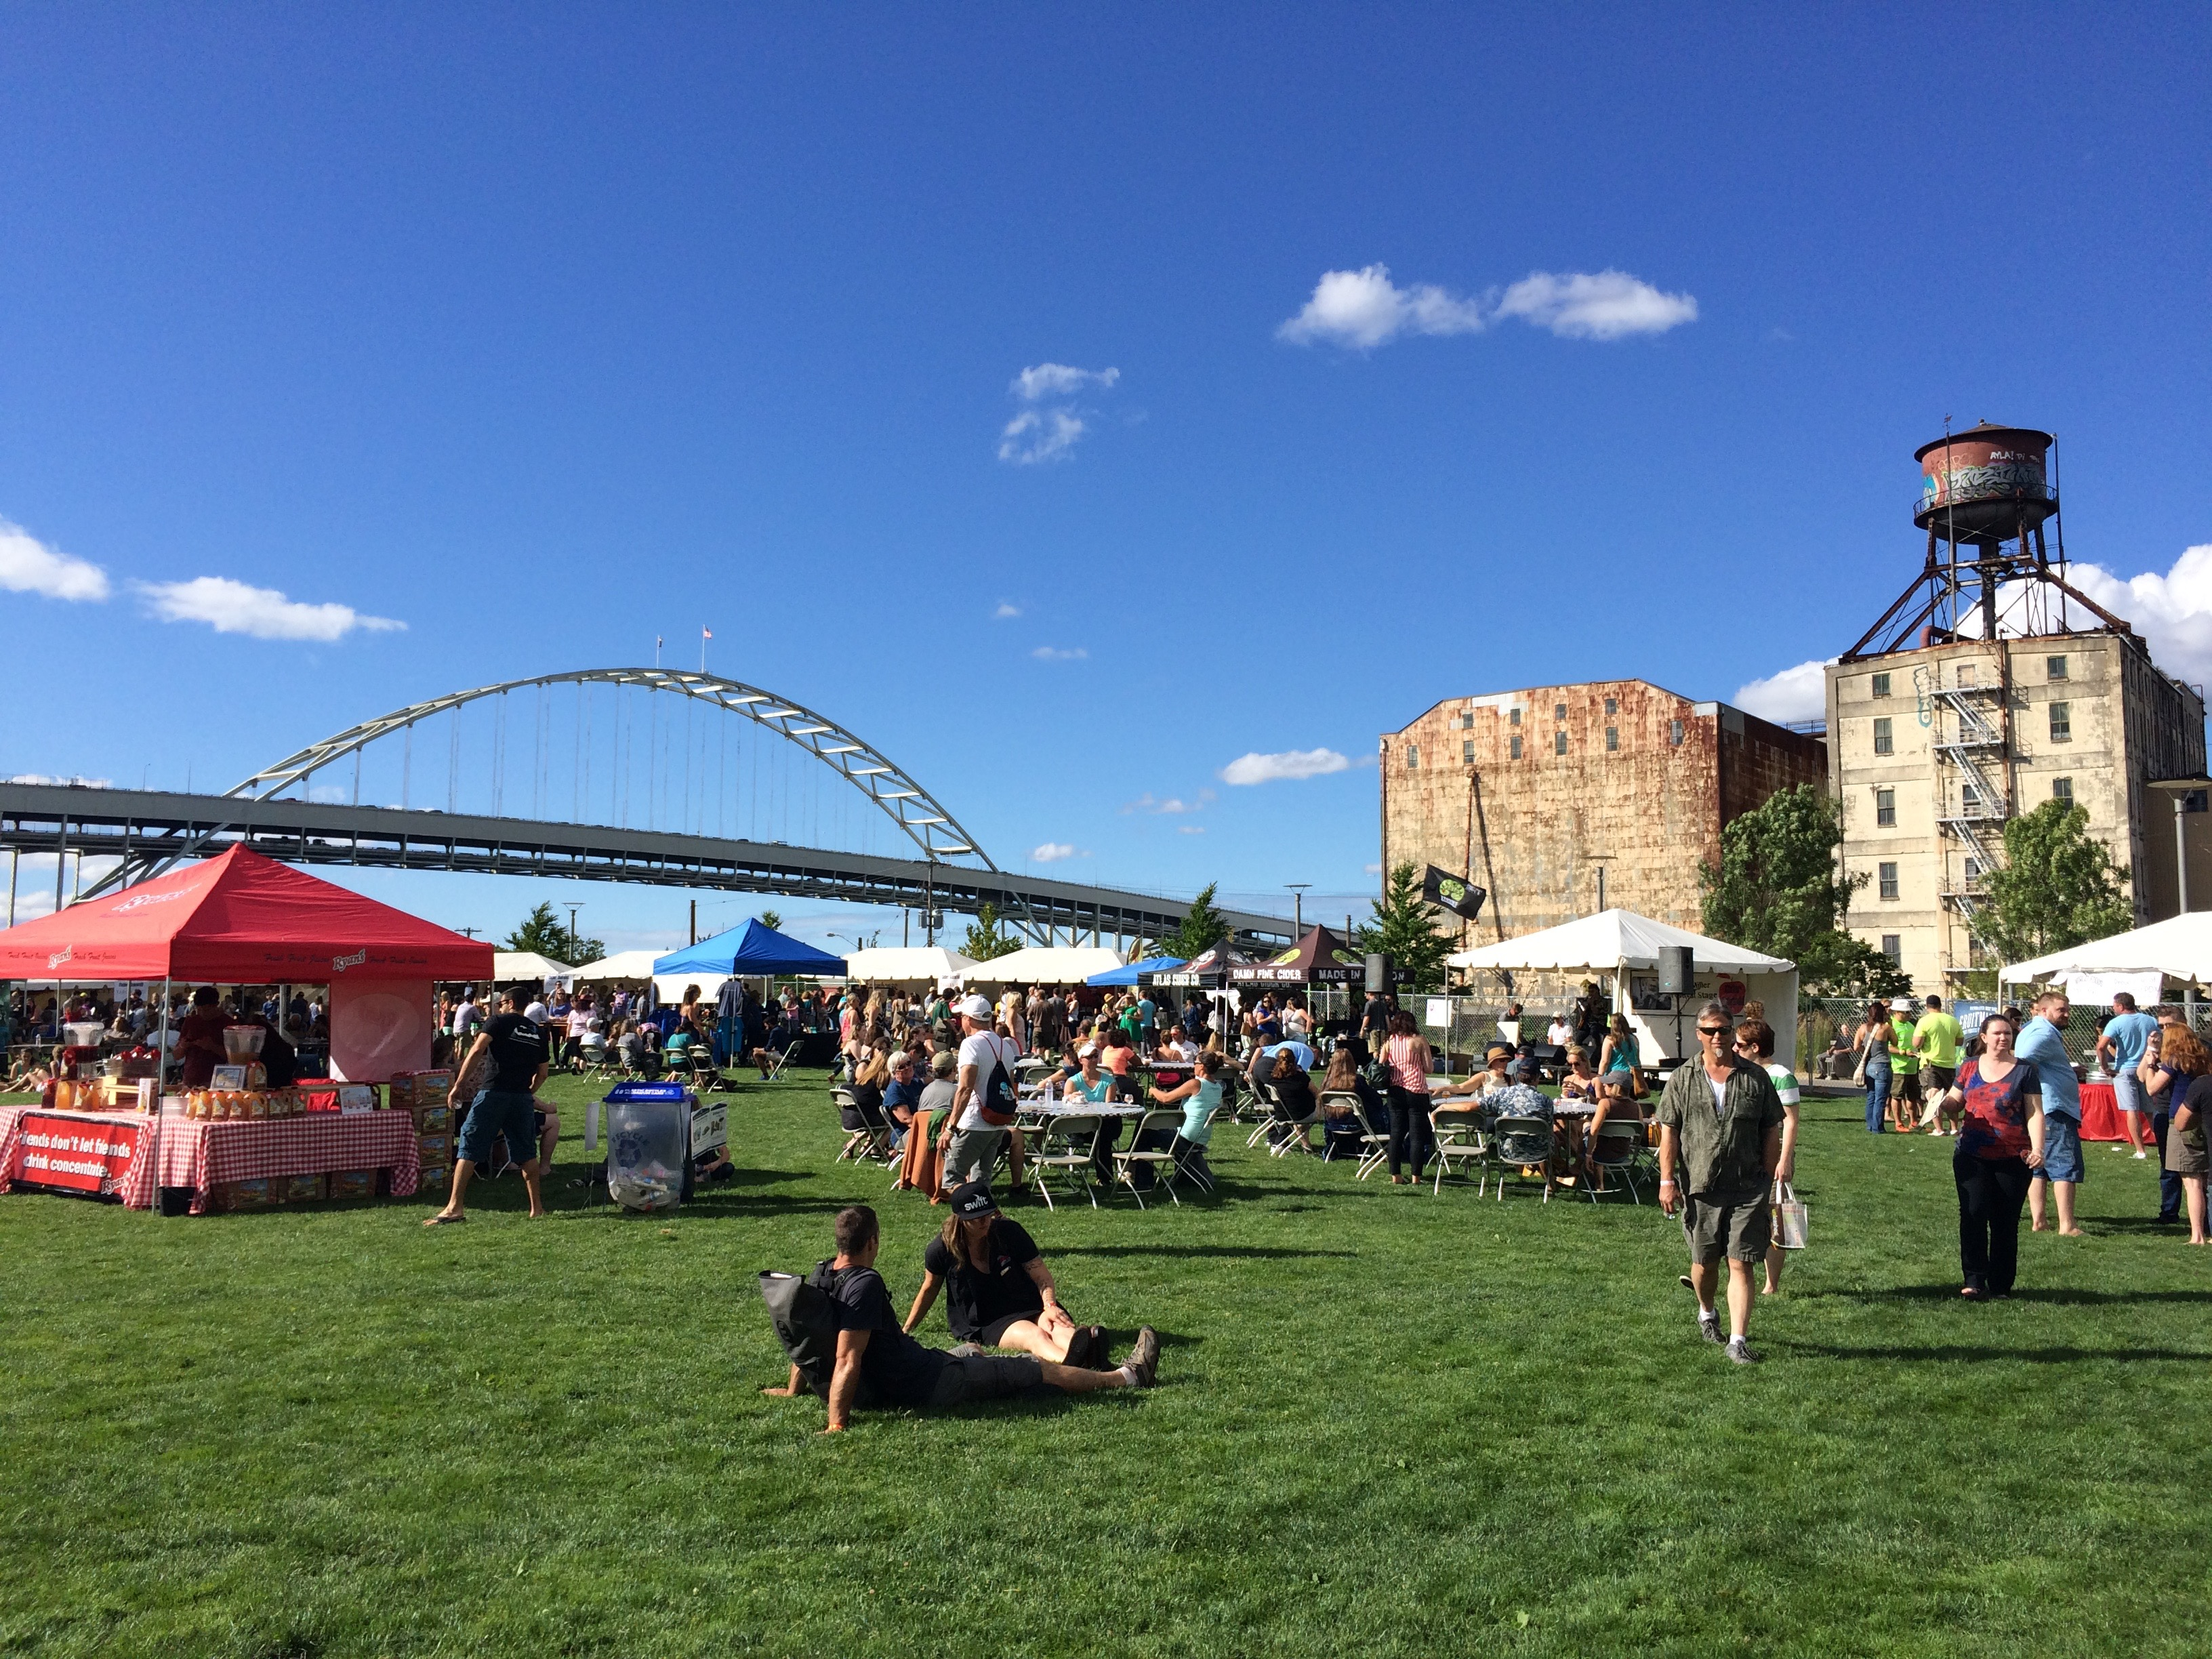 Cider Summit PDX at The Fields Neighborhood Park. (photo by BREWPUBLIC)